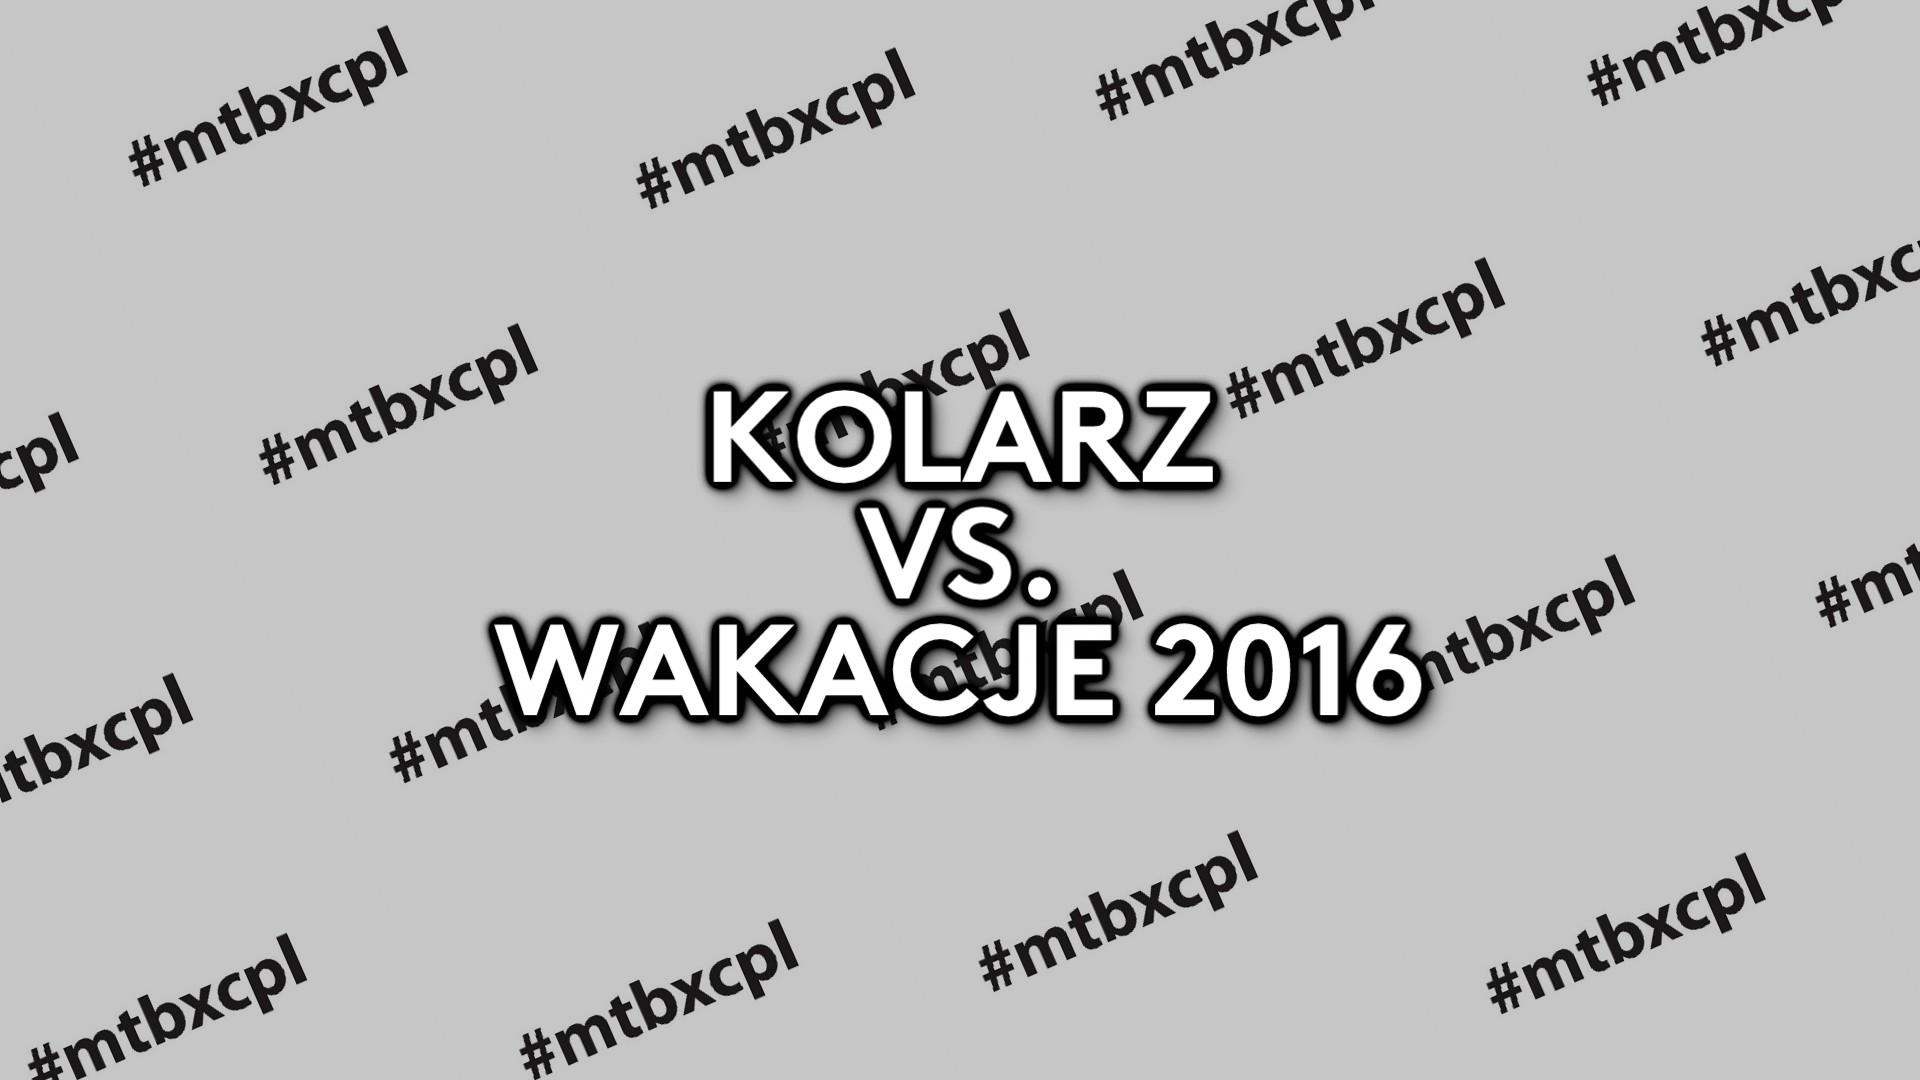 KOLARZ vs. WAKACJE 2016